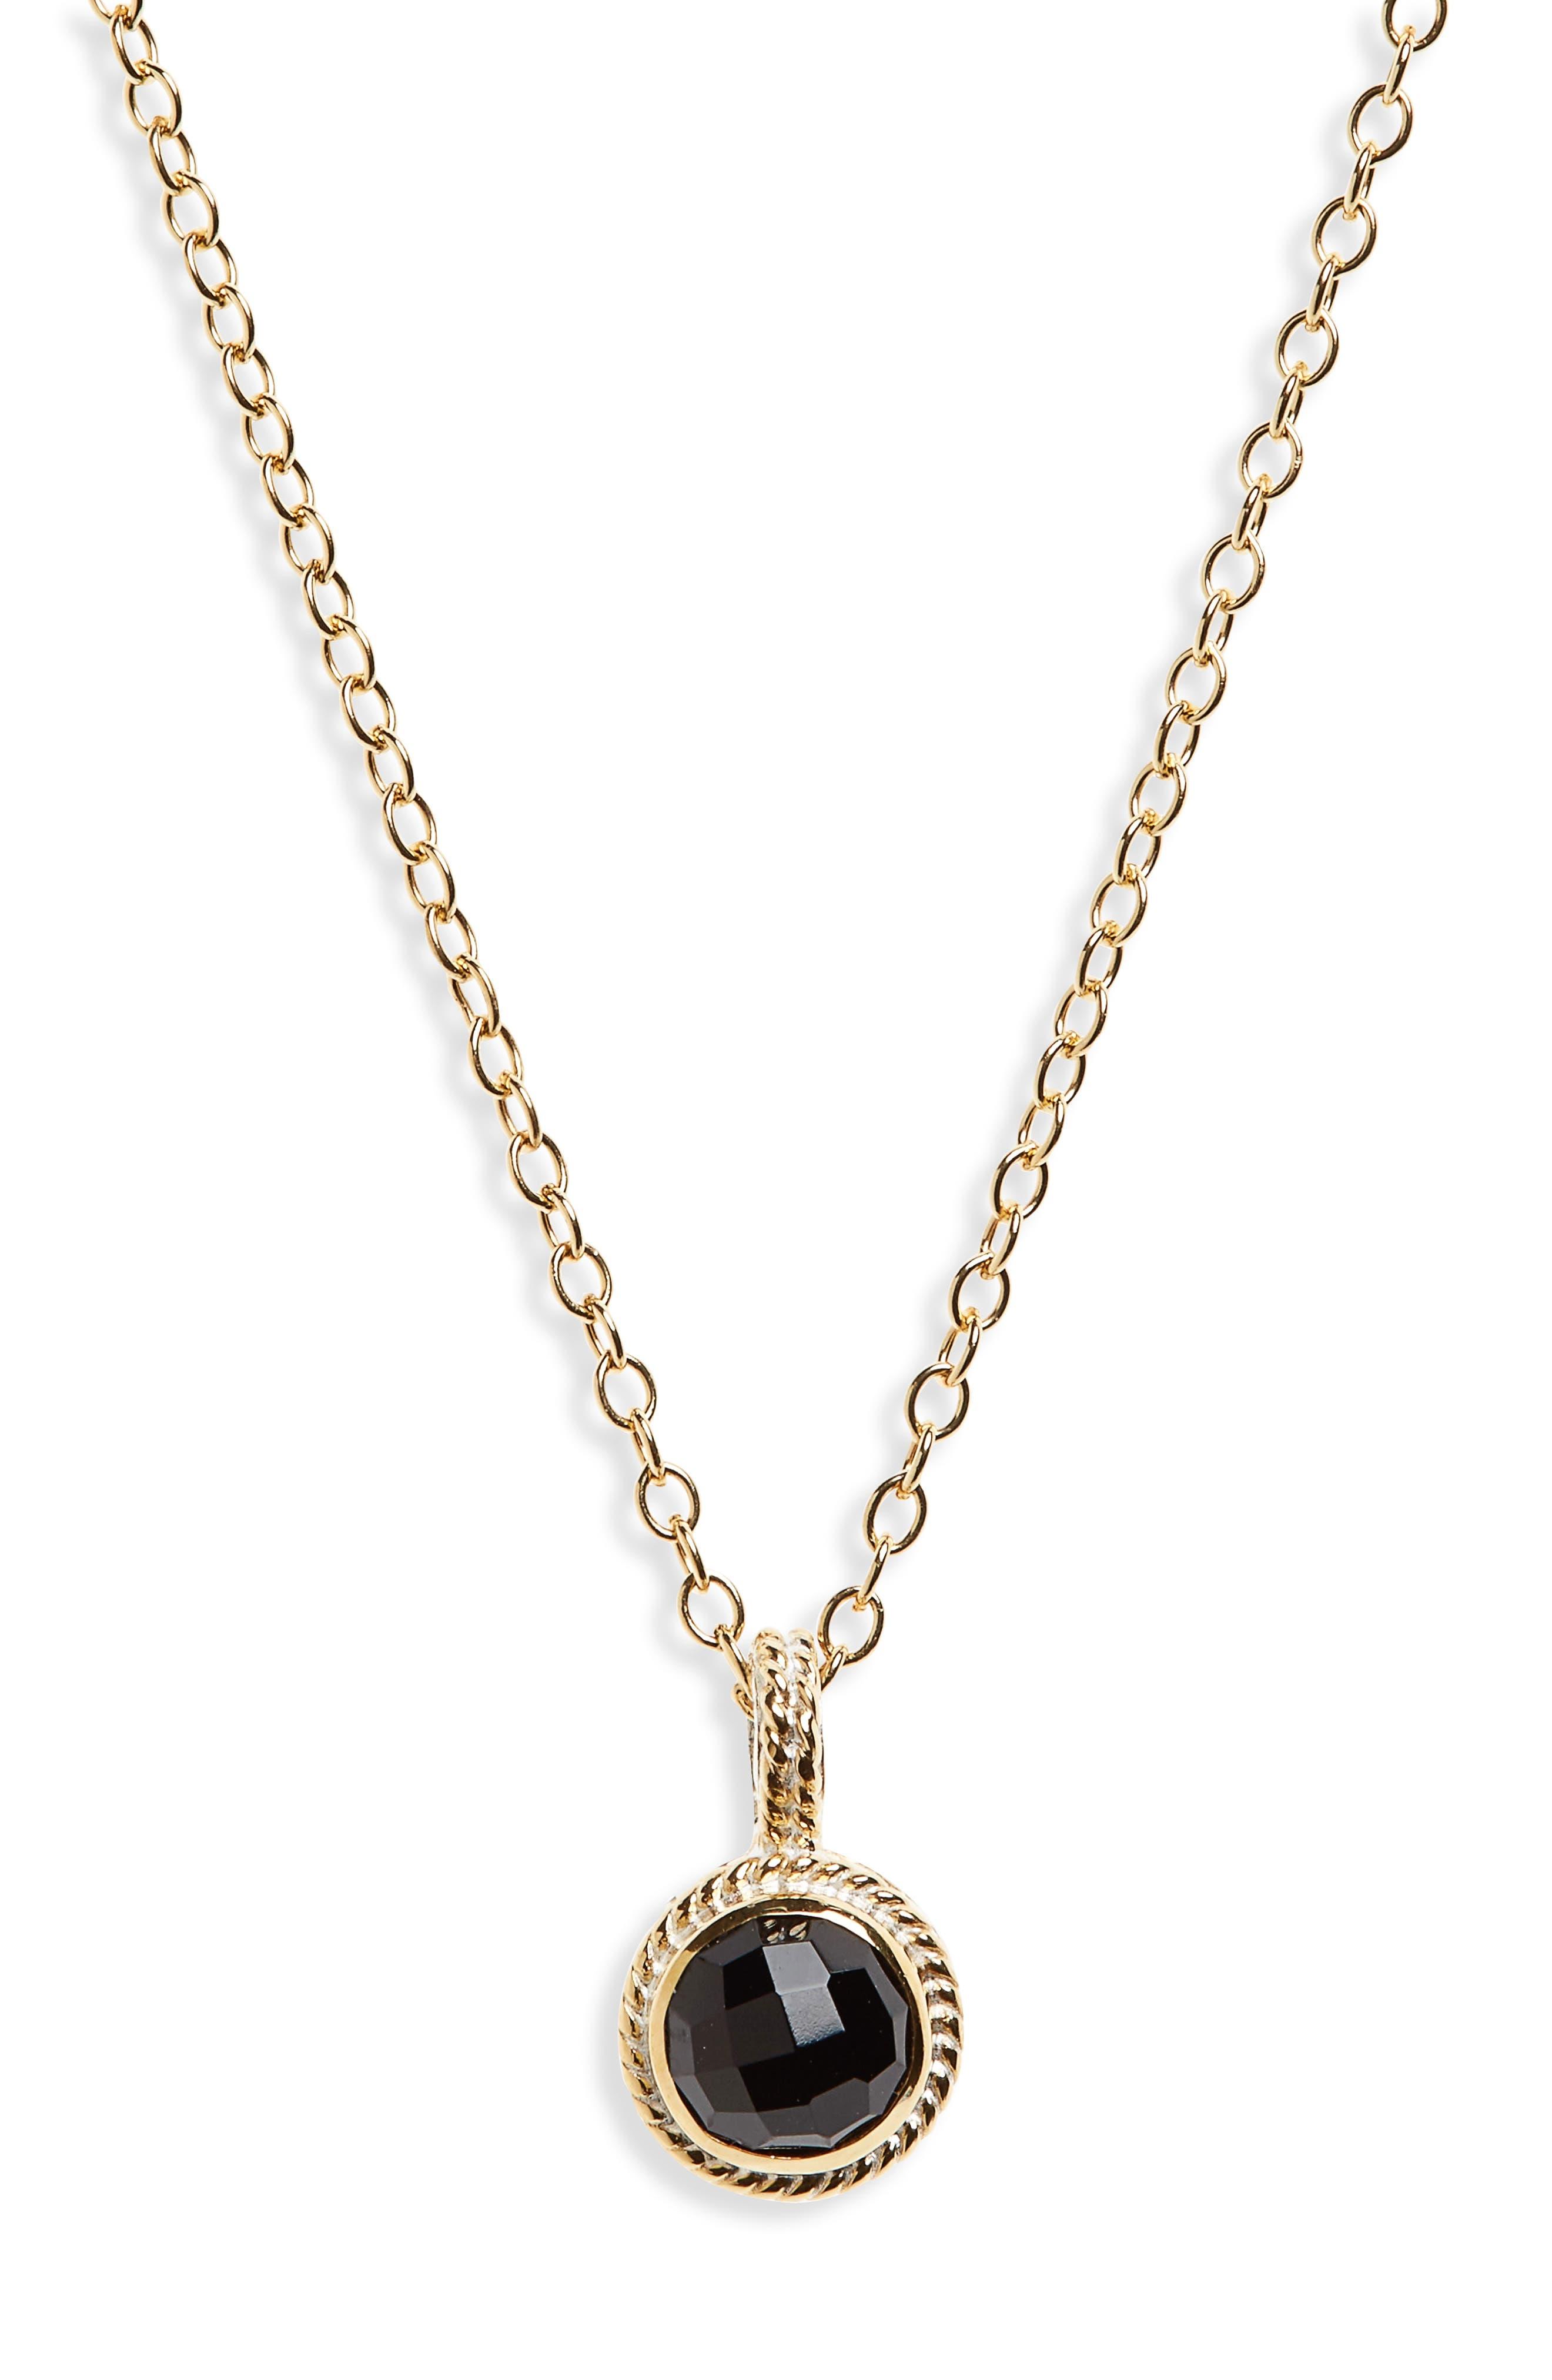 Semiprecious Stone Round Drop Pendant Necklace,                         Main,                         color, Gold/ Black Onyx